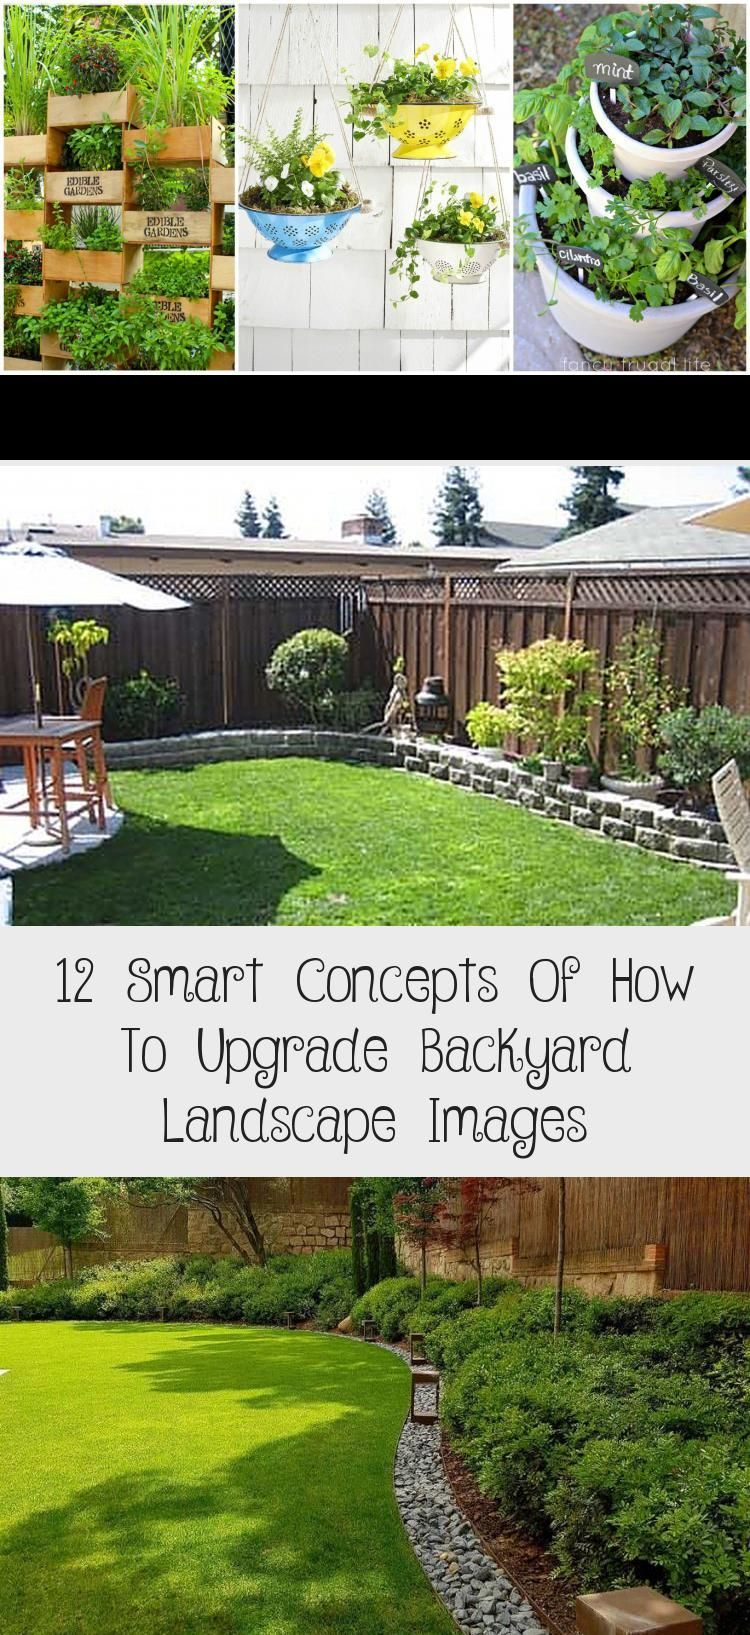 My Blog En Blog In 2020 Small Backyard Gardens Small Backyard Landscaping Backyard Garden